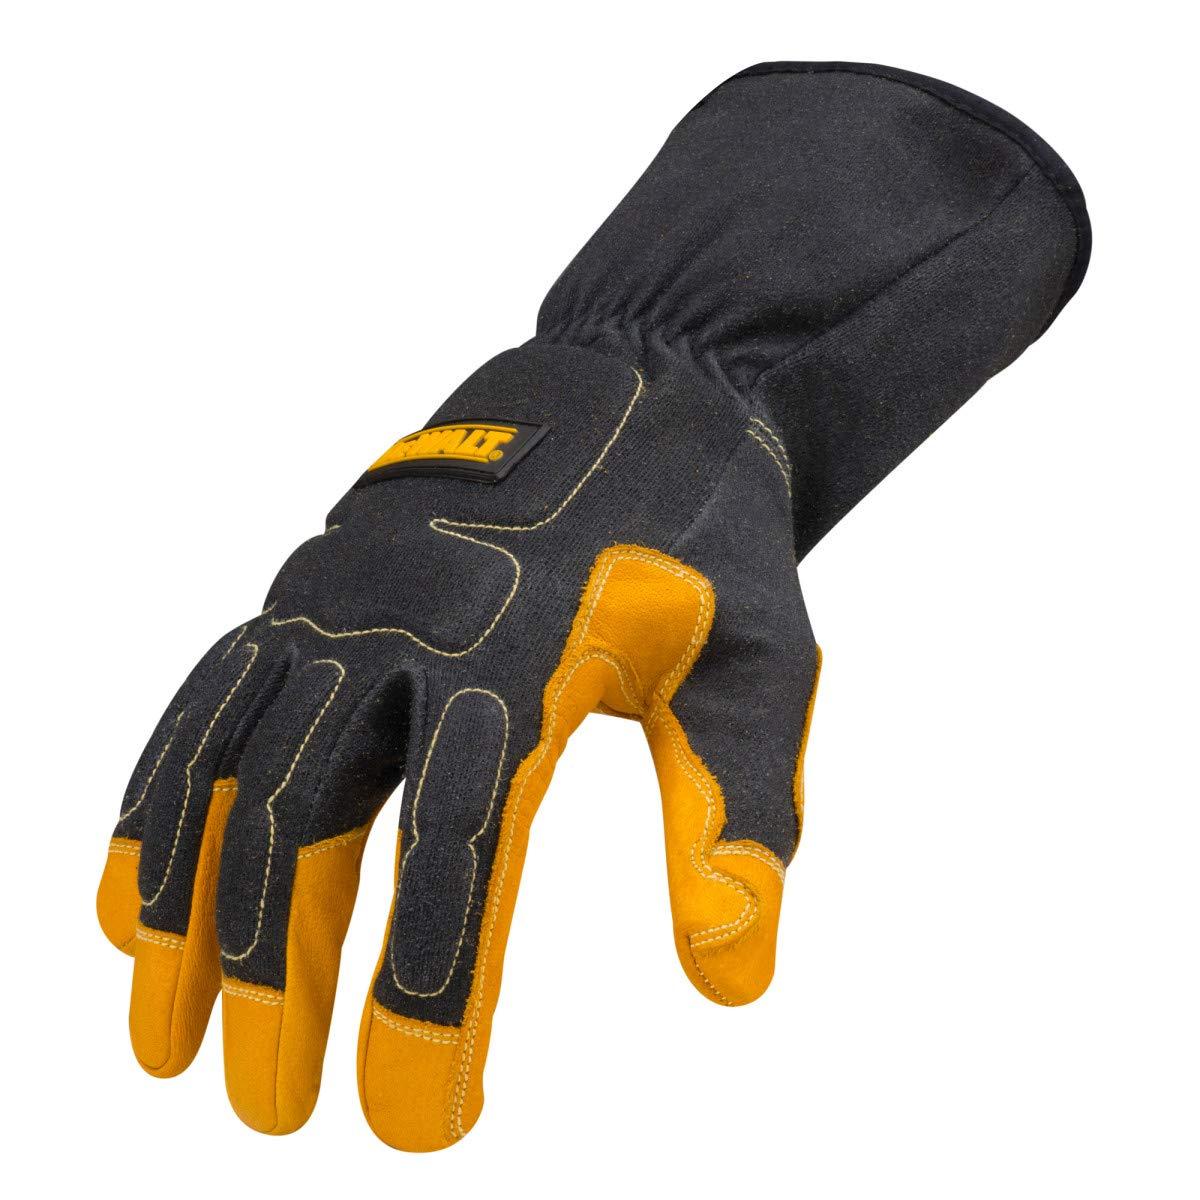 DEWALT DXMF02051XL Premium MIG/TIG Welding Gloves, X-Large by DEWALT (Image #1)